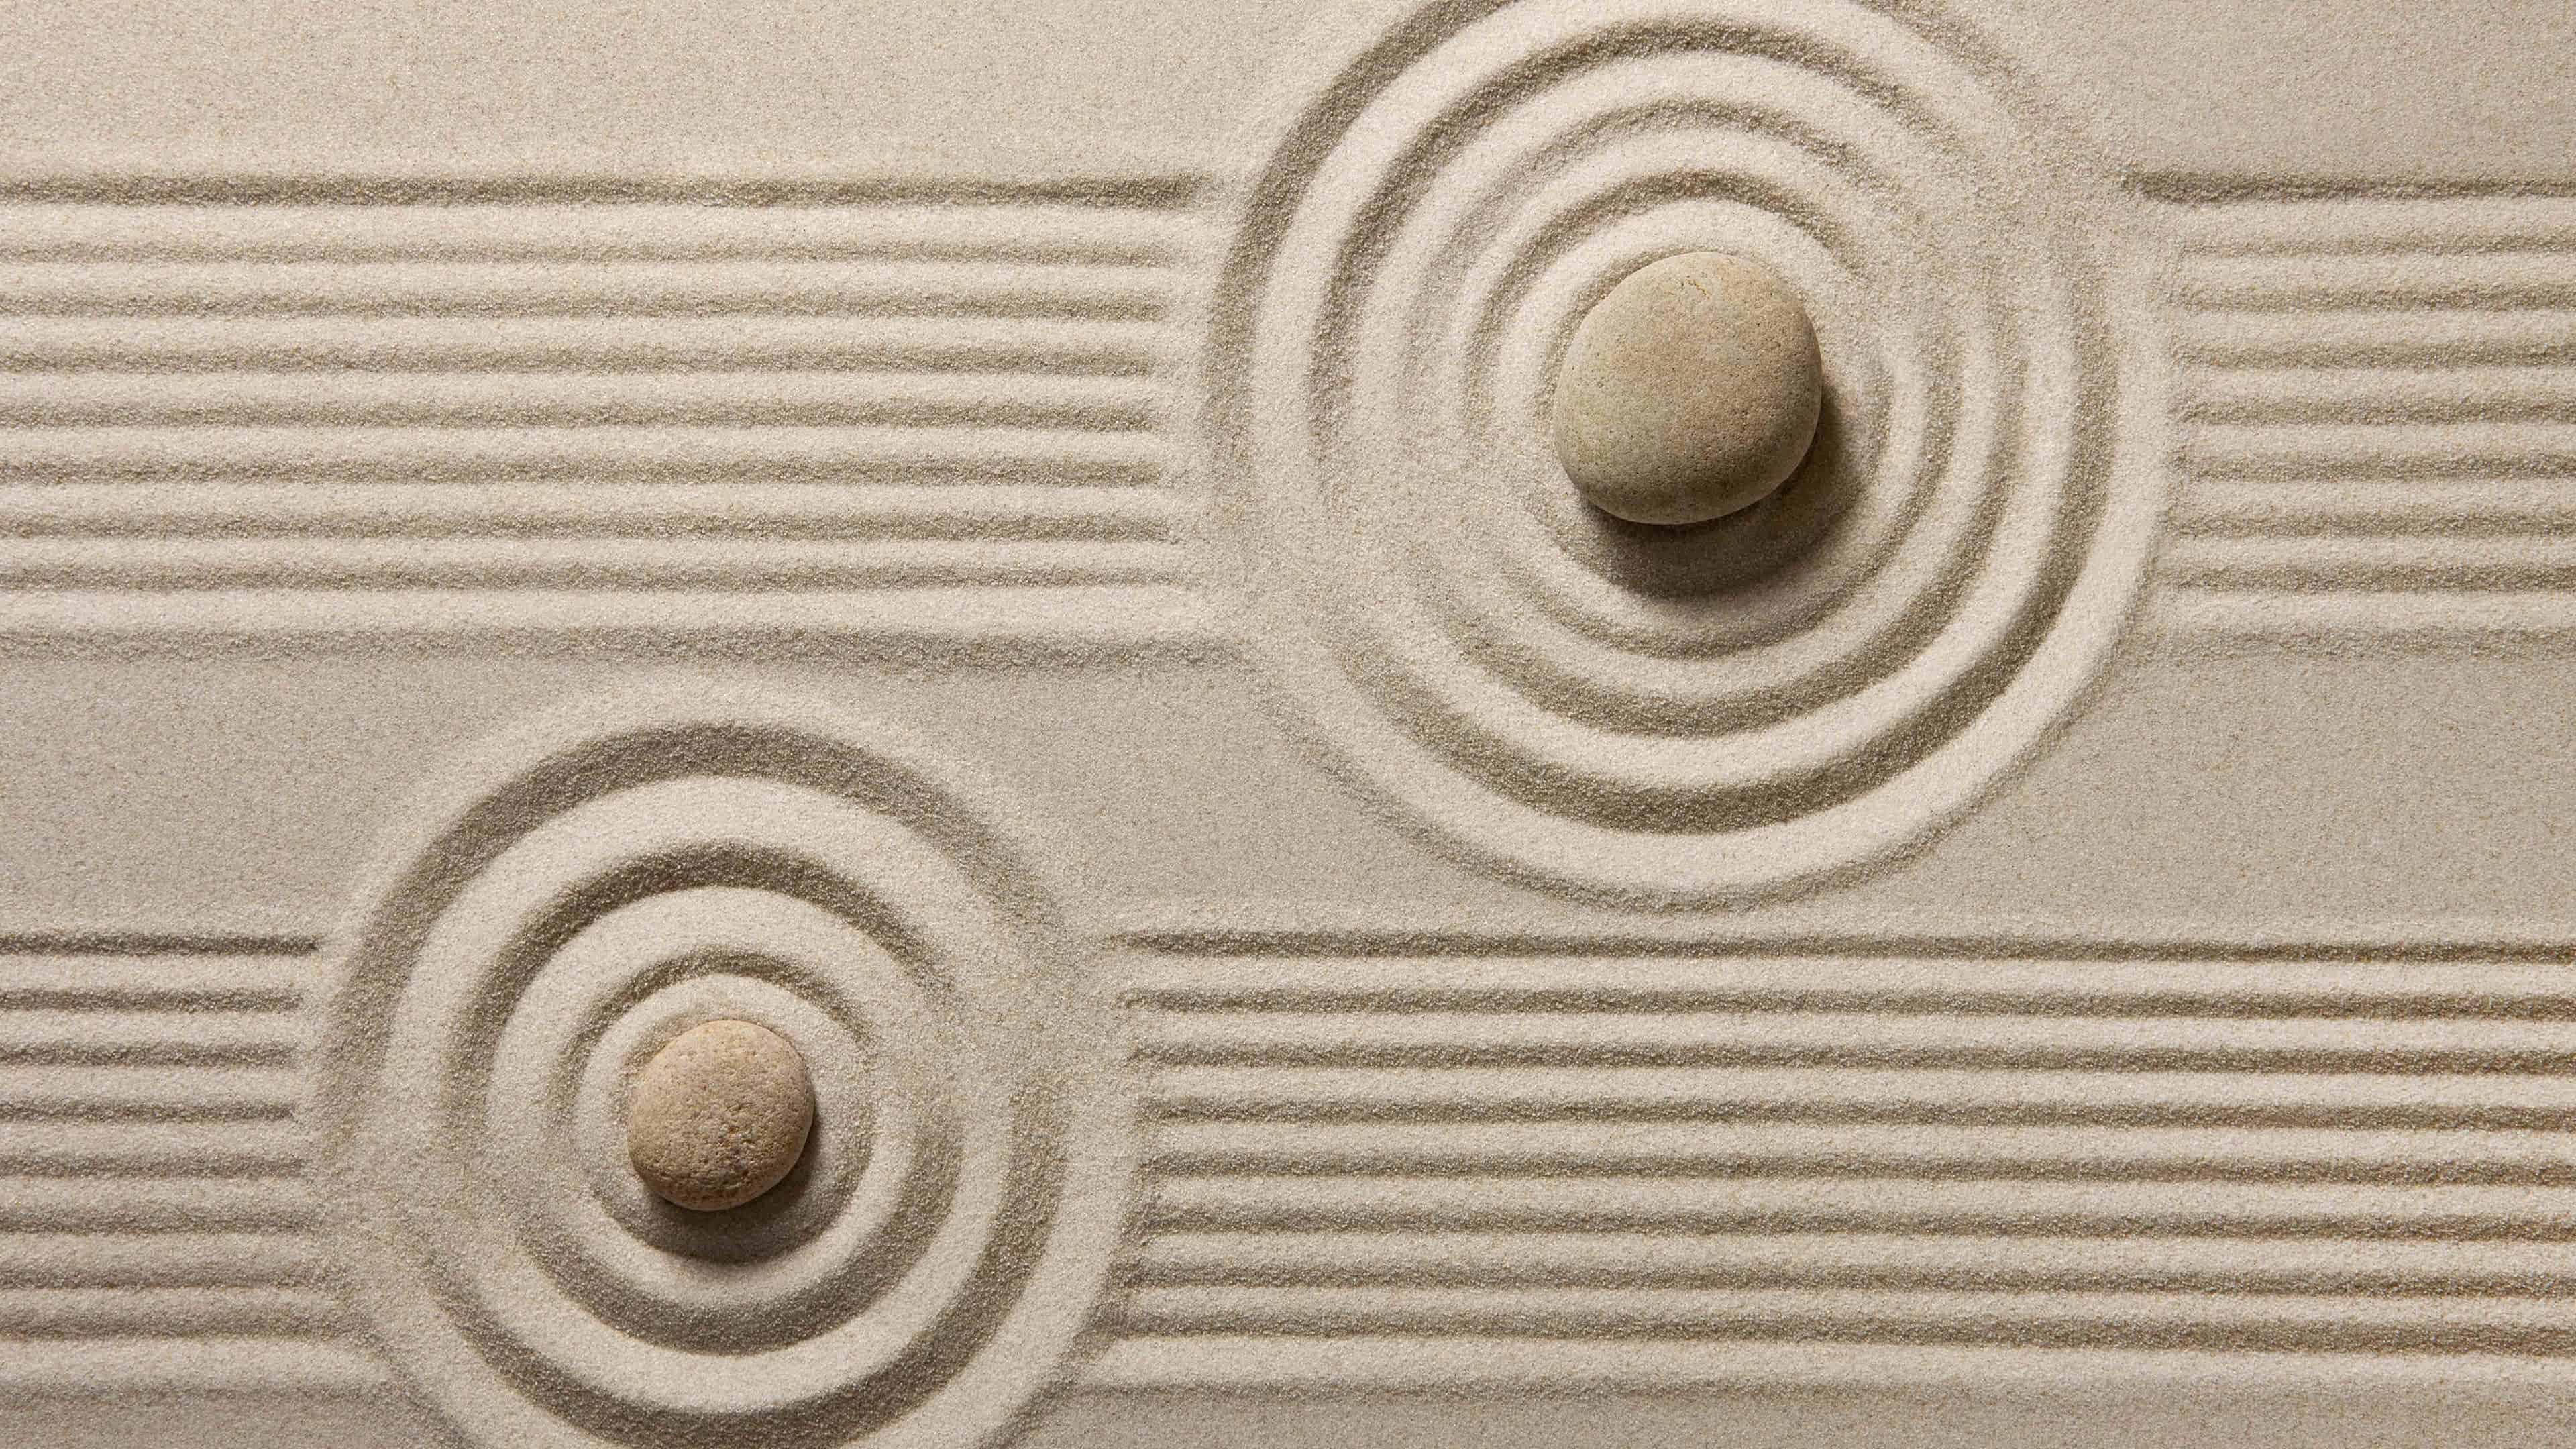 Zen Sand Japanese Rock Garden UHD 4K Wallpaper Pixelz